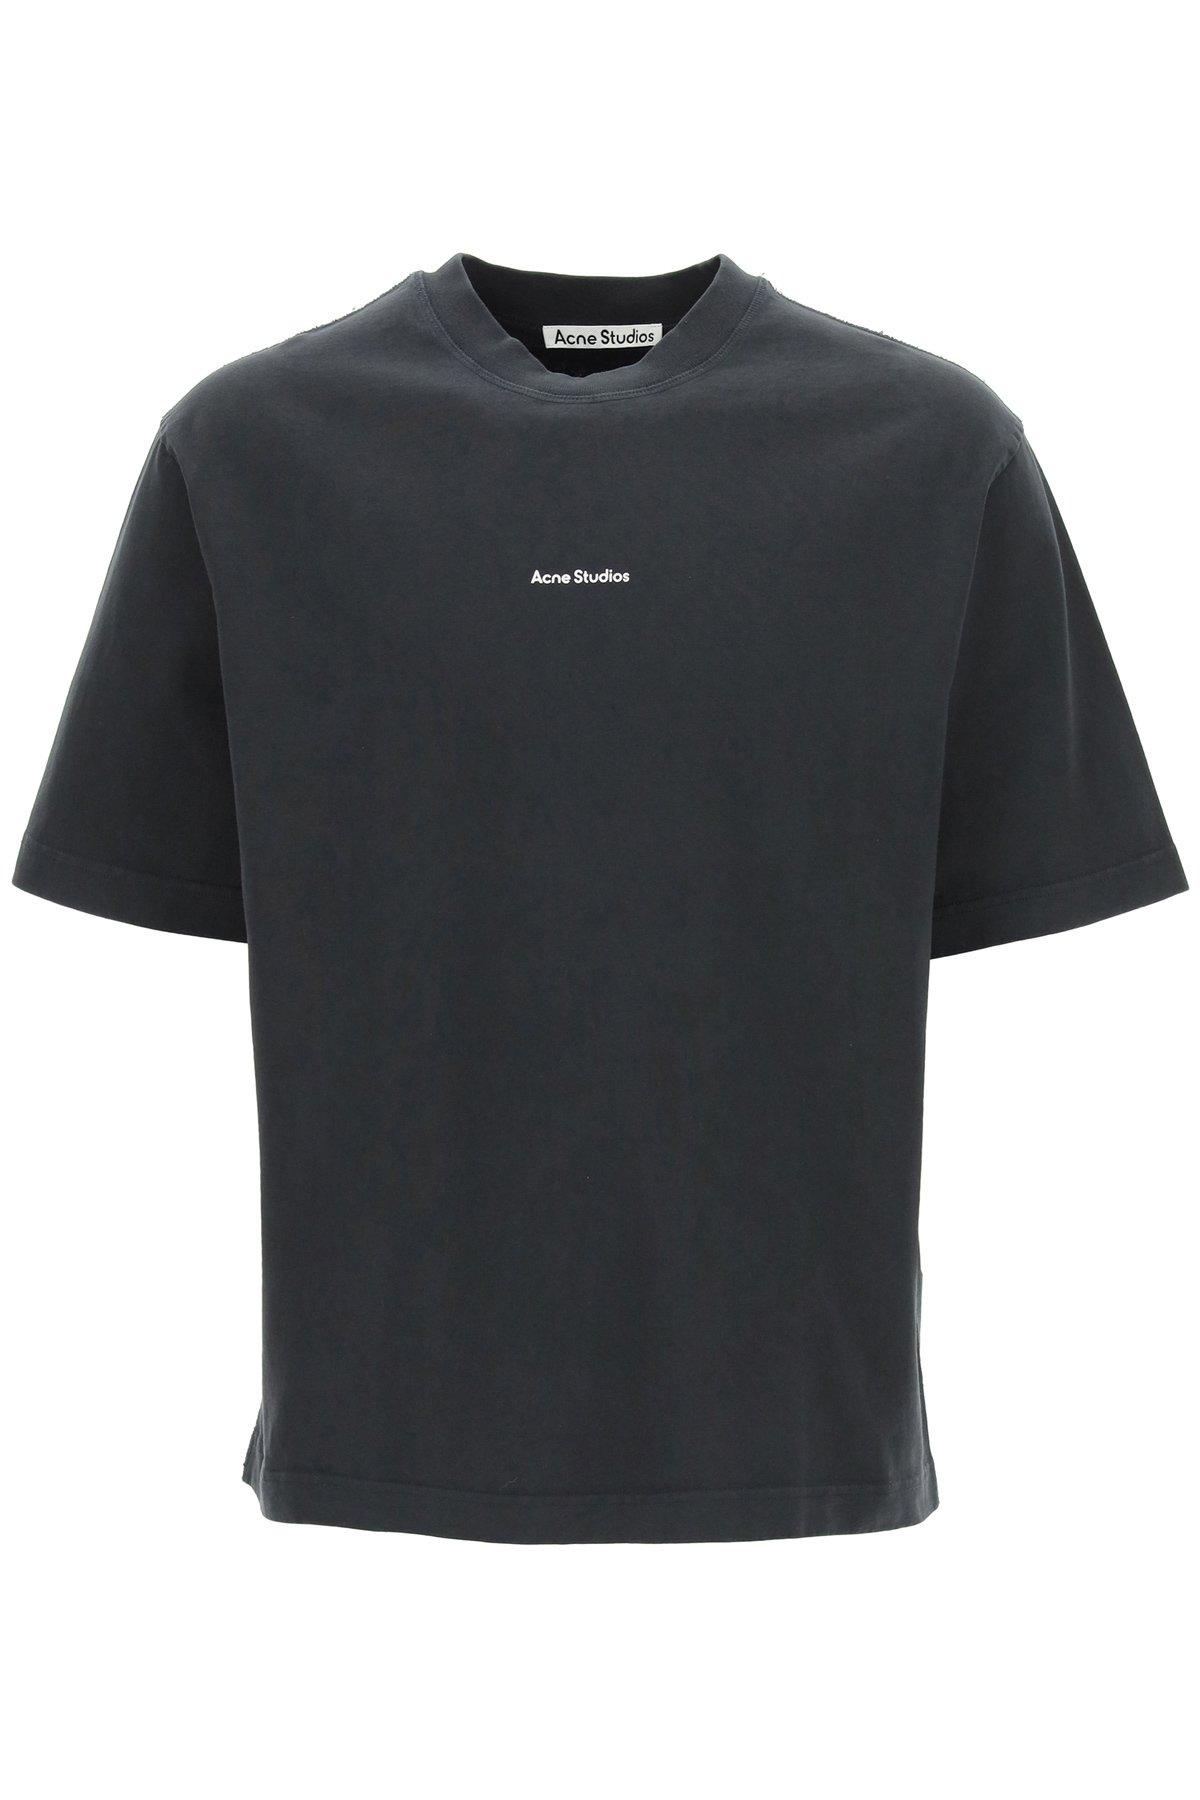 Acne studios t-shirt micro logo